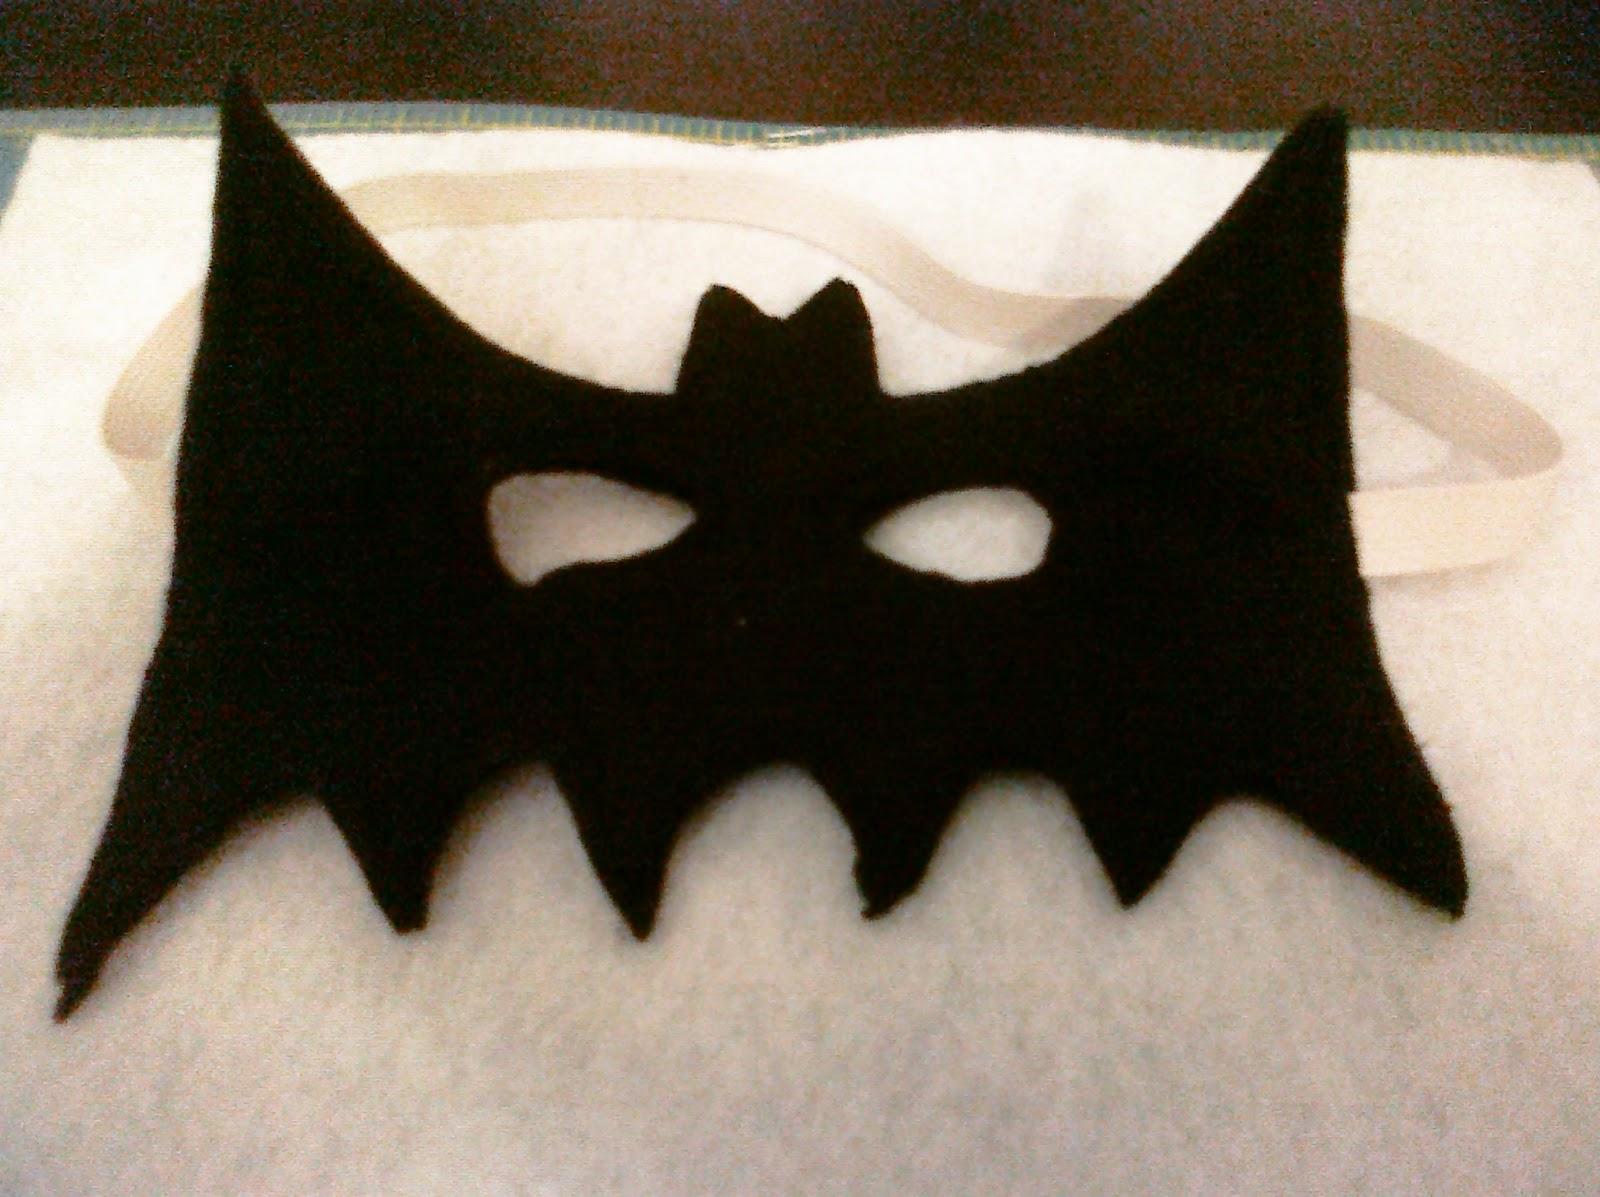 Felt Batman Mask Template Images & Pictures - Becuo